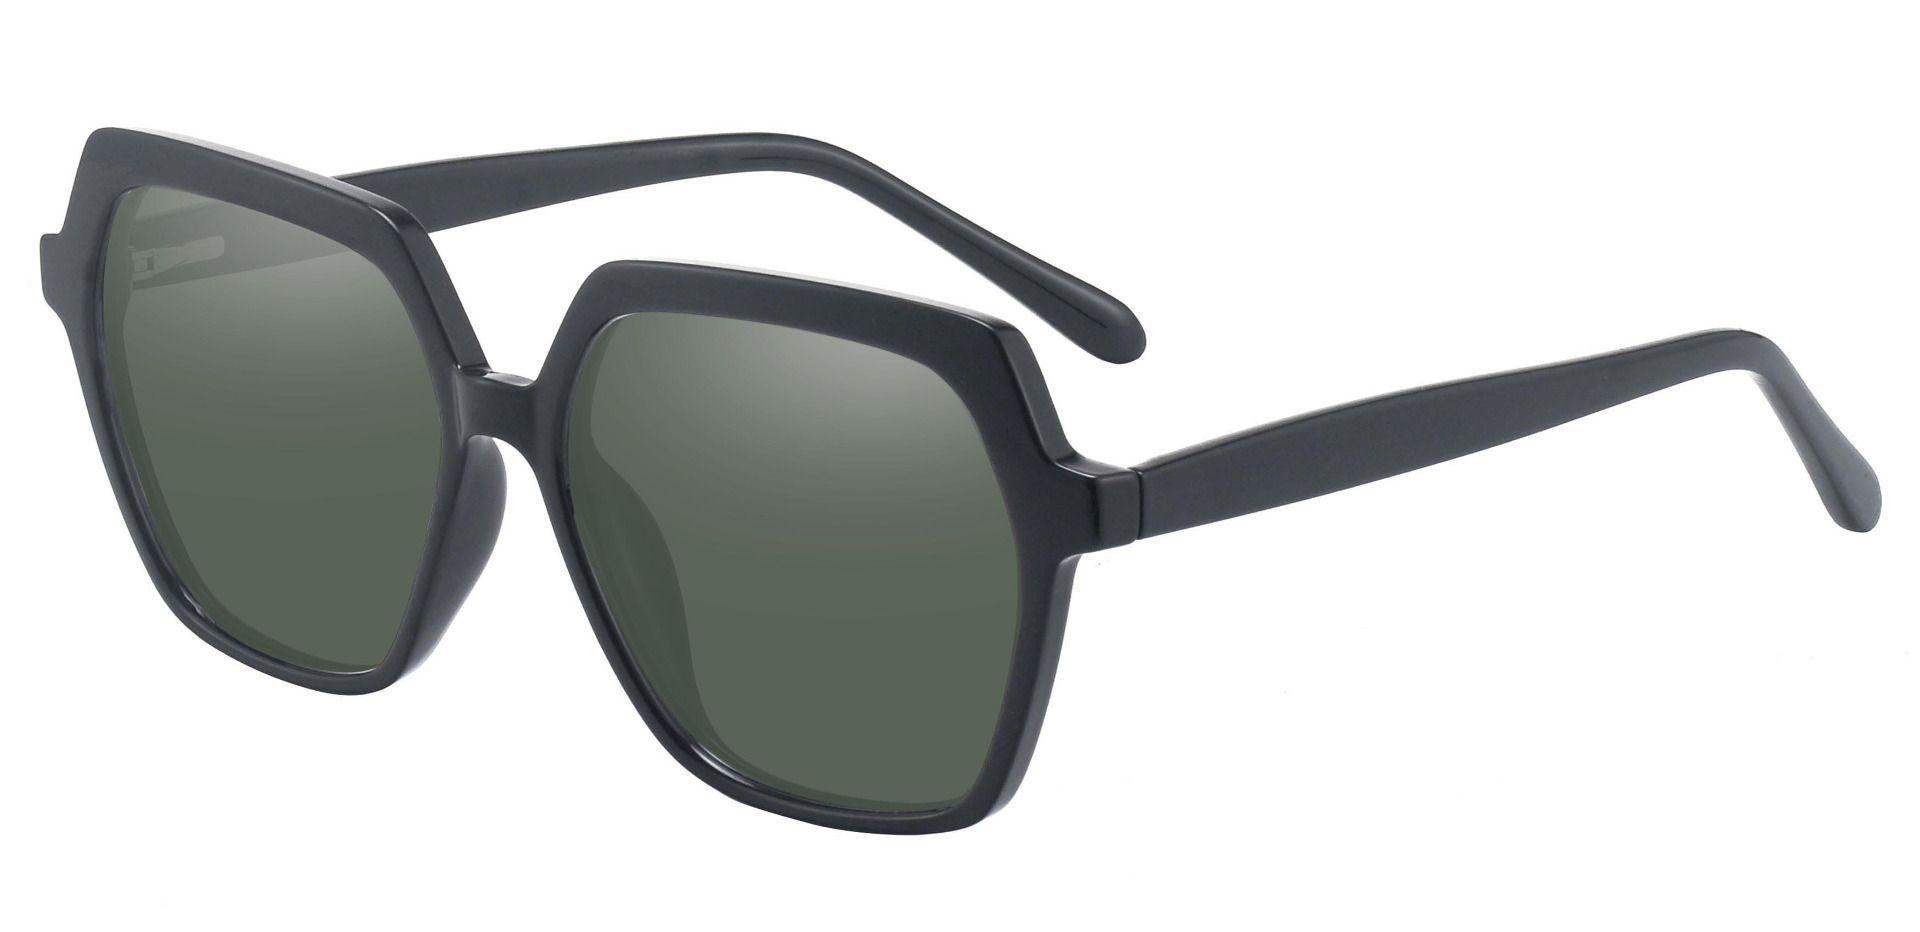 Regent Geometric Lined Bifocal Sunglasses - Black Frame With Green Lenses